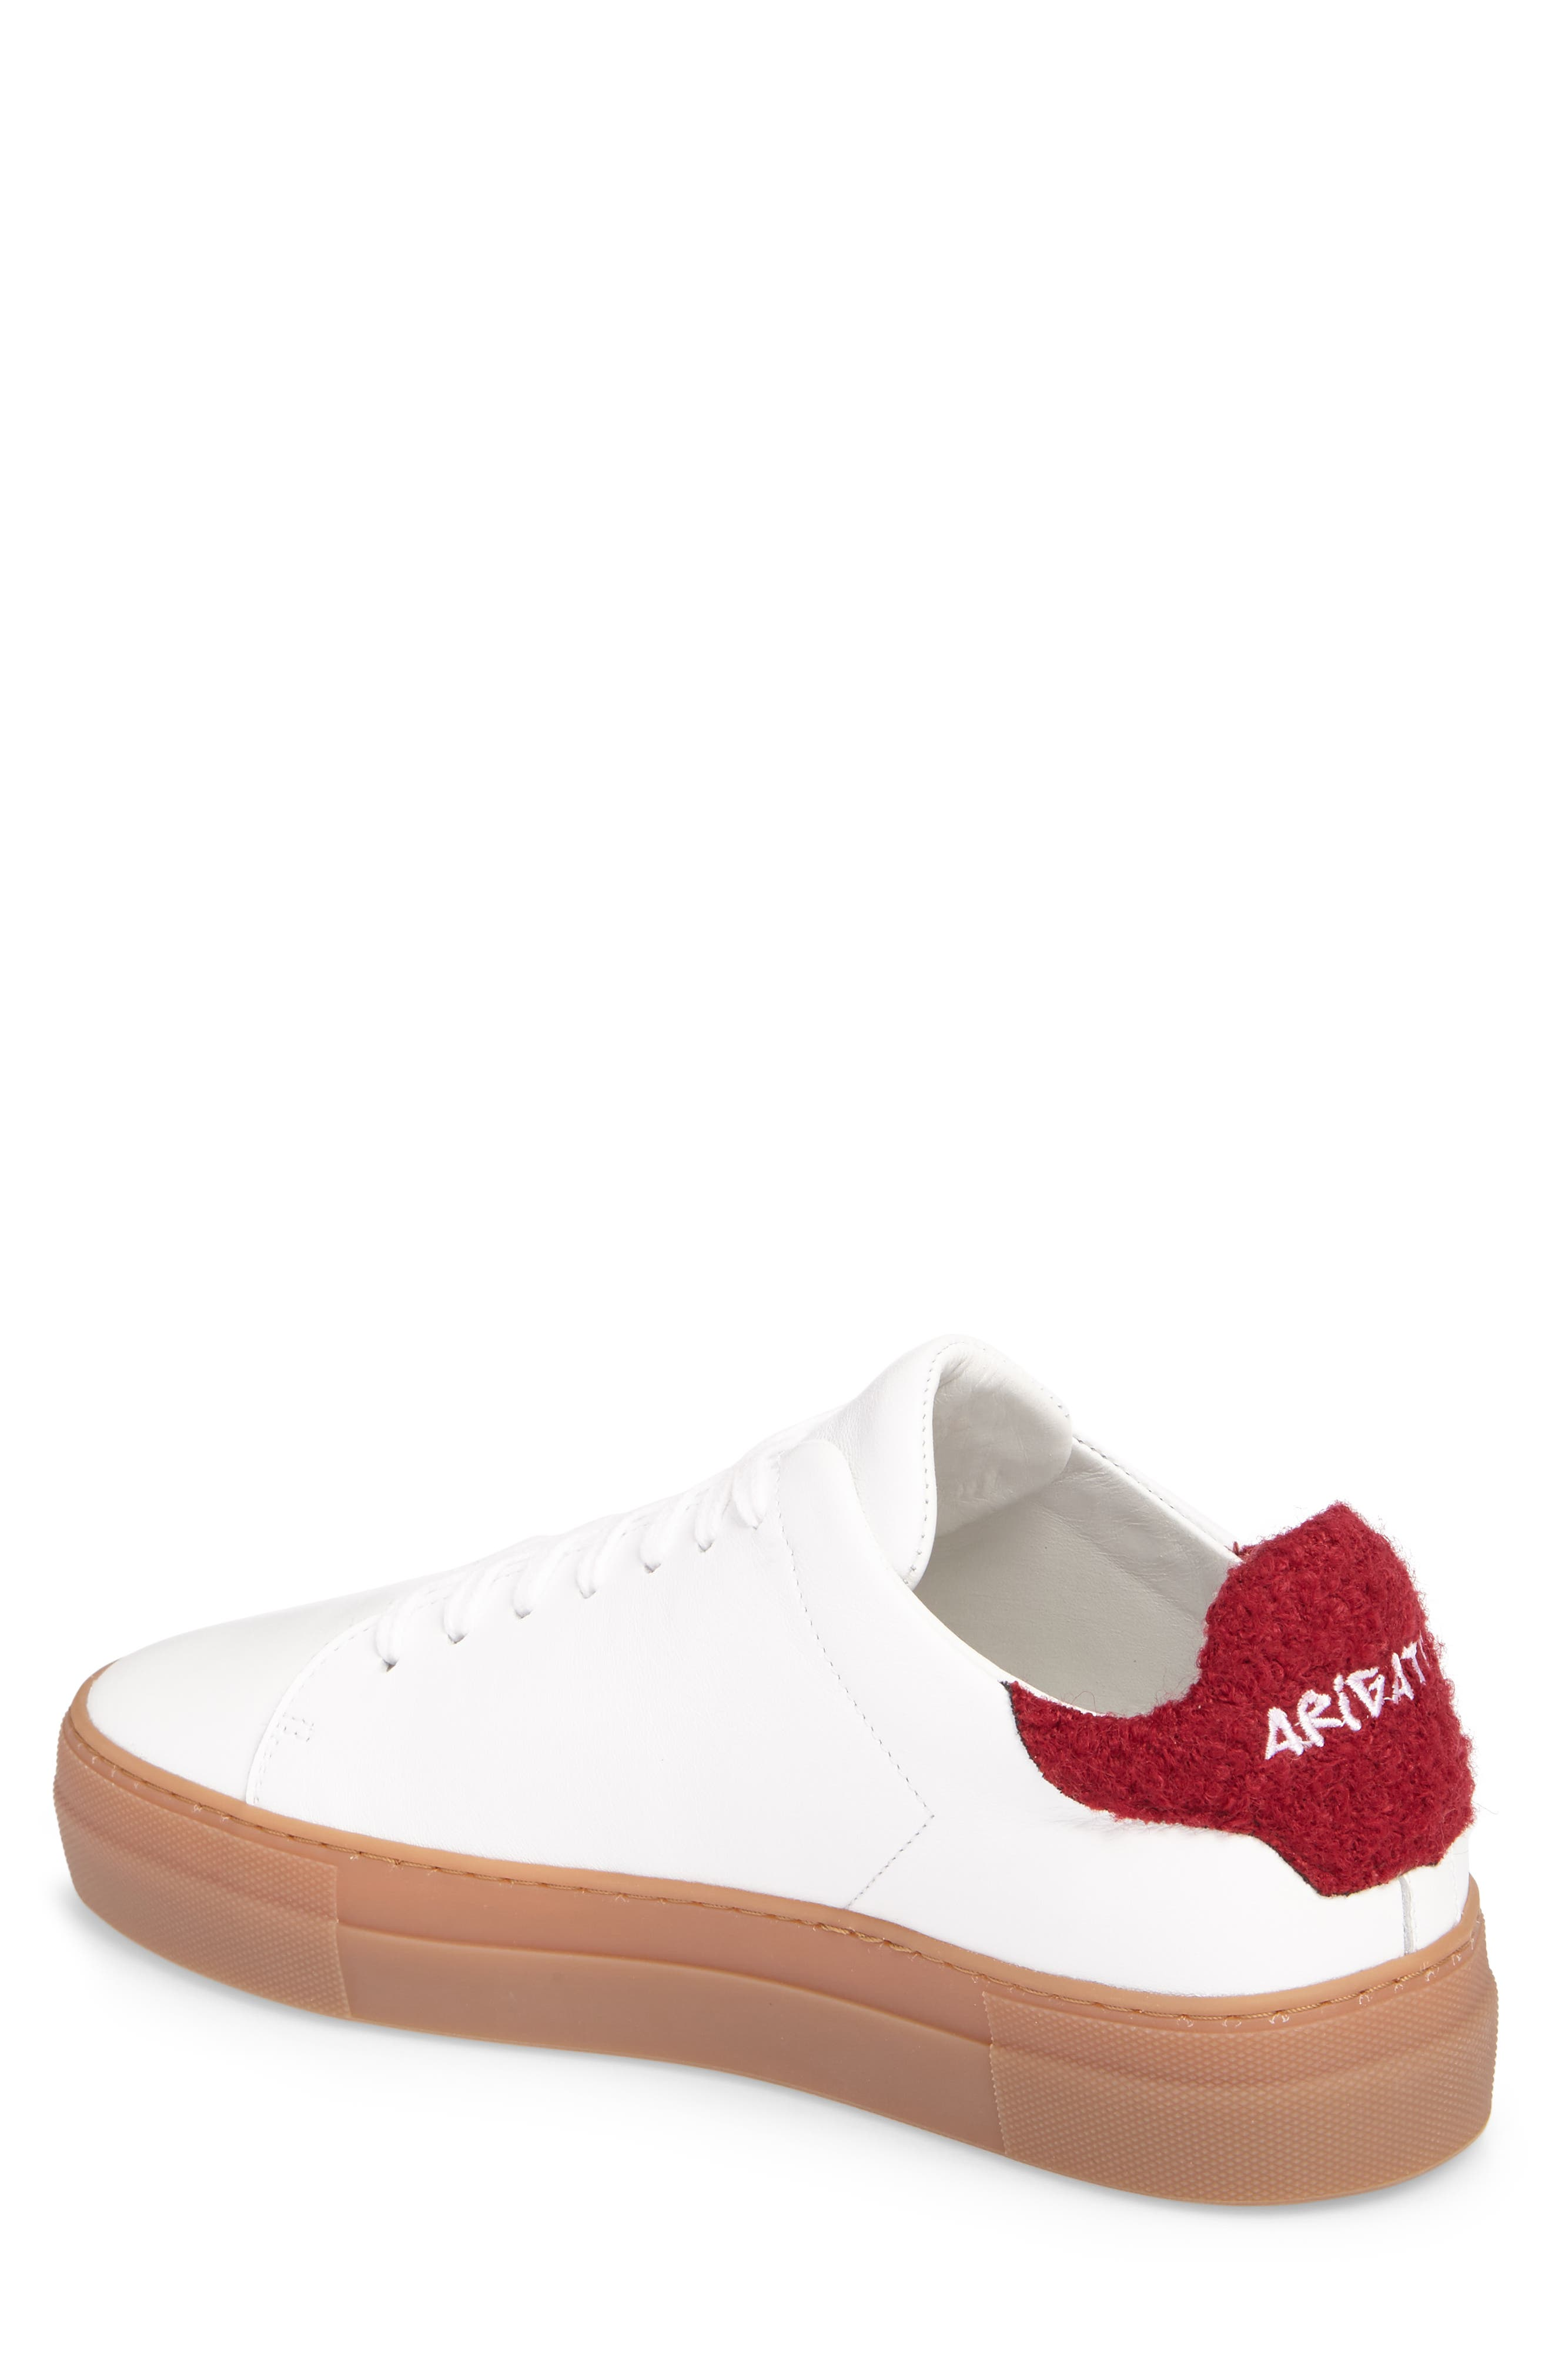 Clean 360 Fuzzy Heel Sneaker,                             Alternate thumbnail 2, color,                             White